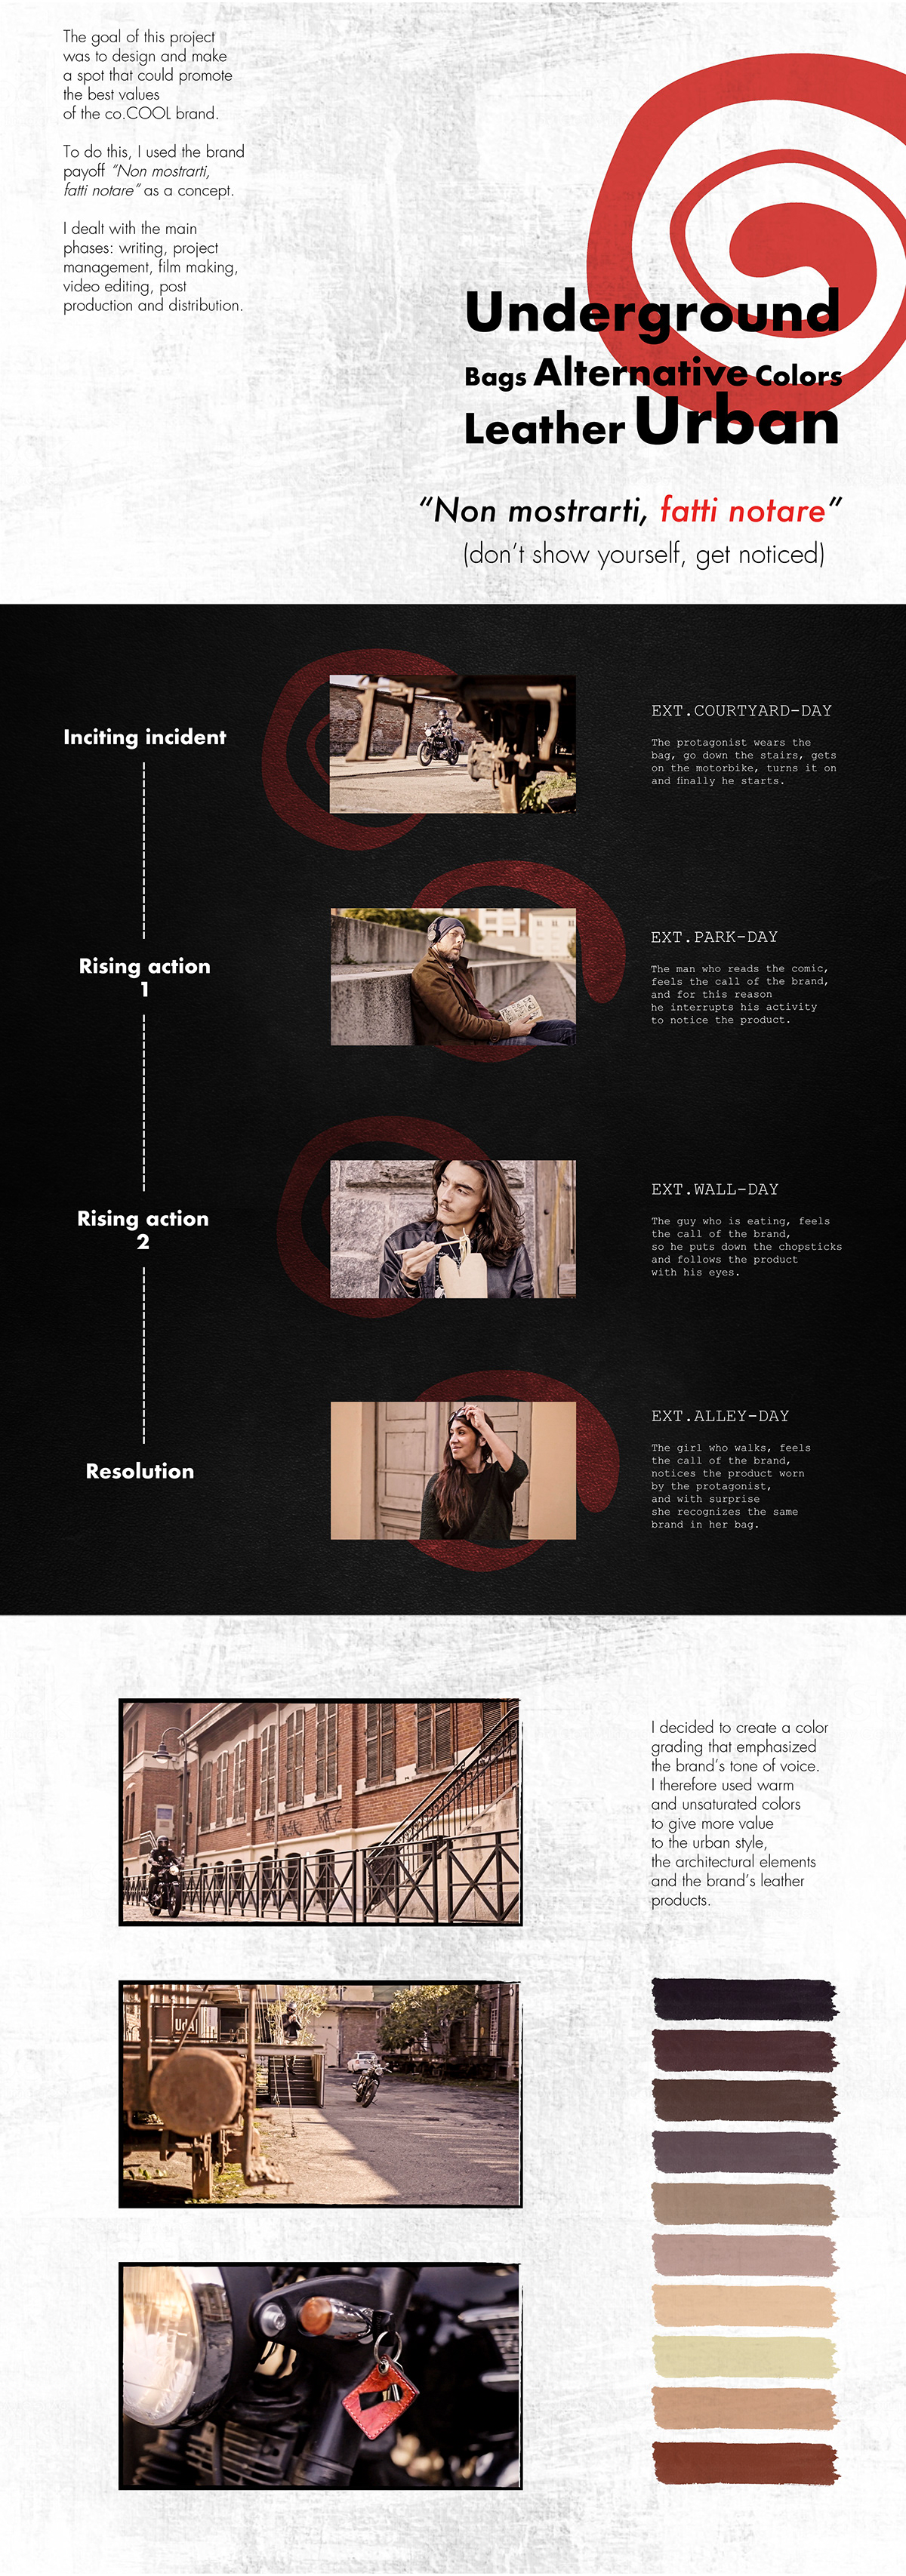 brand brand identity branding  color grading Video Editing videomaking